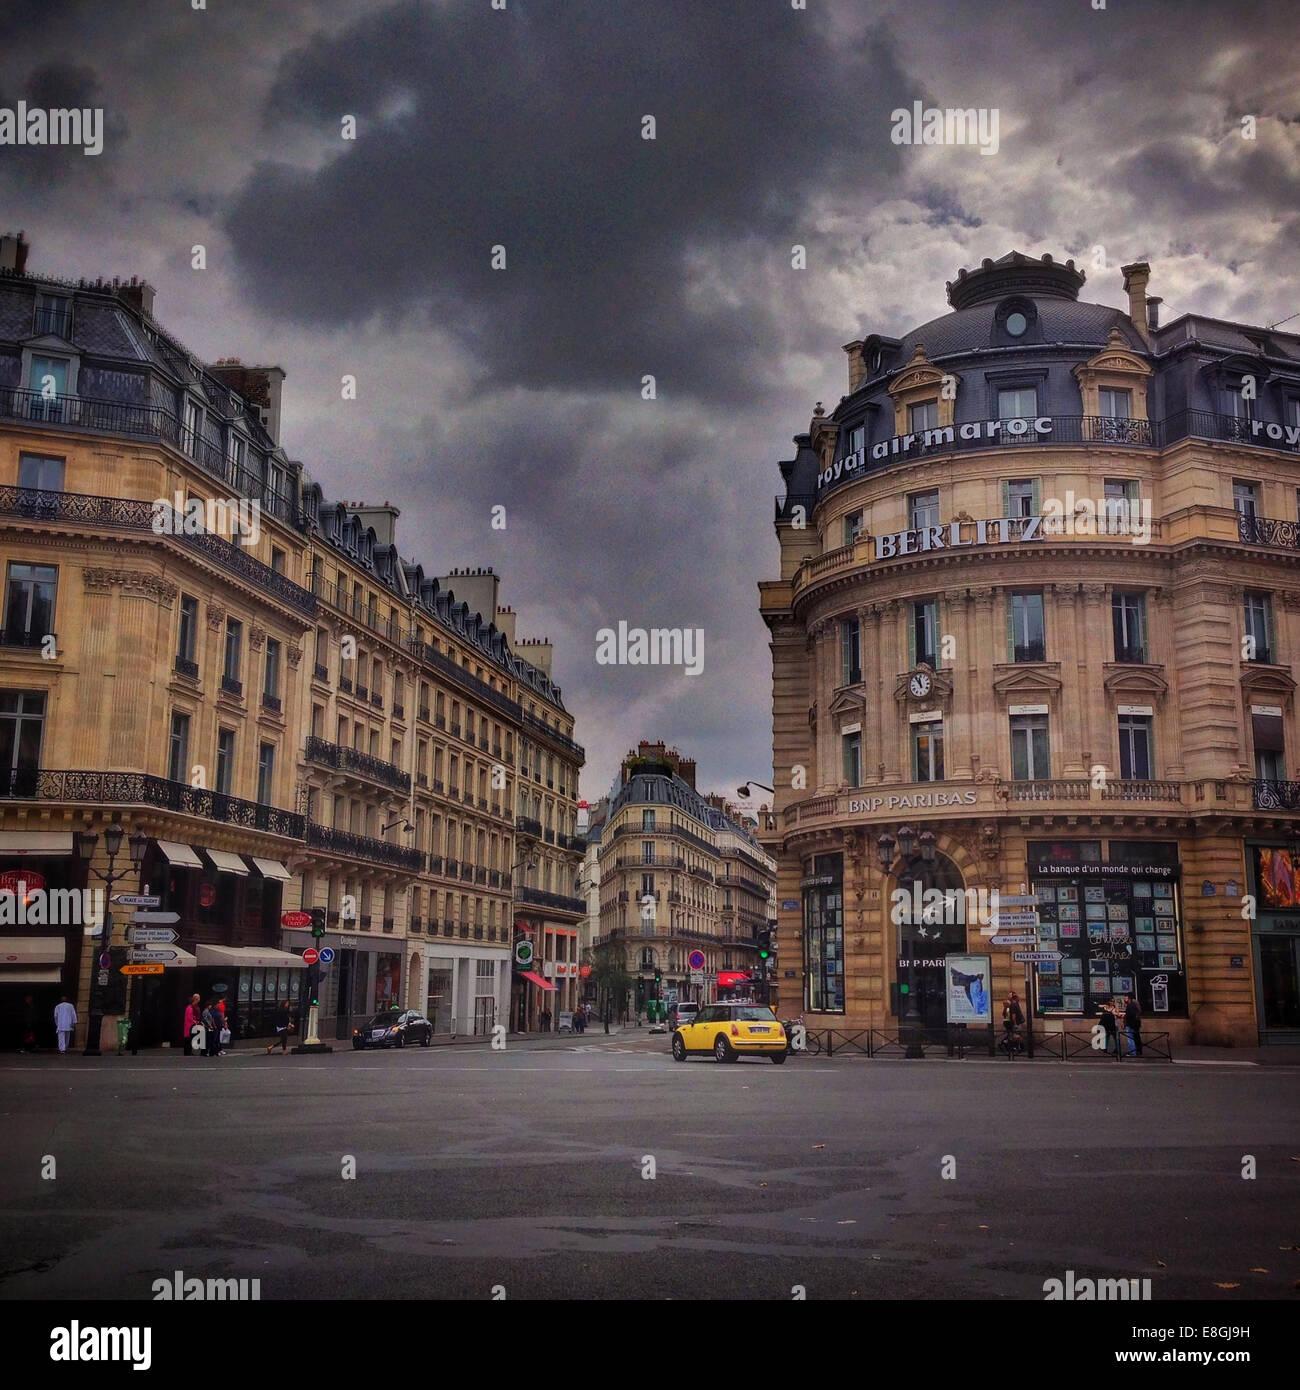 Street scene - Stock Image